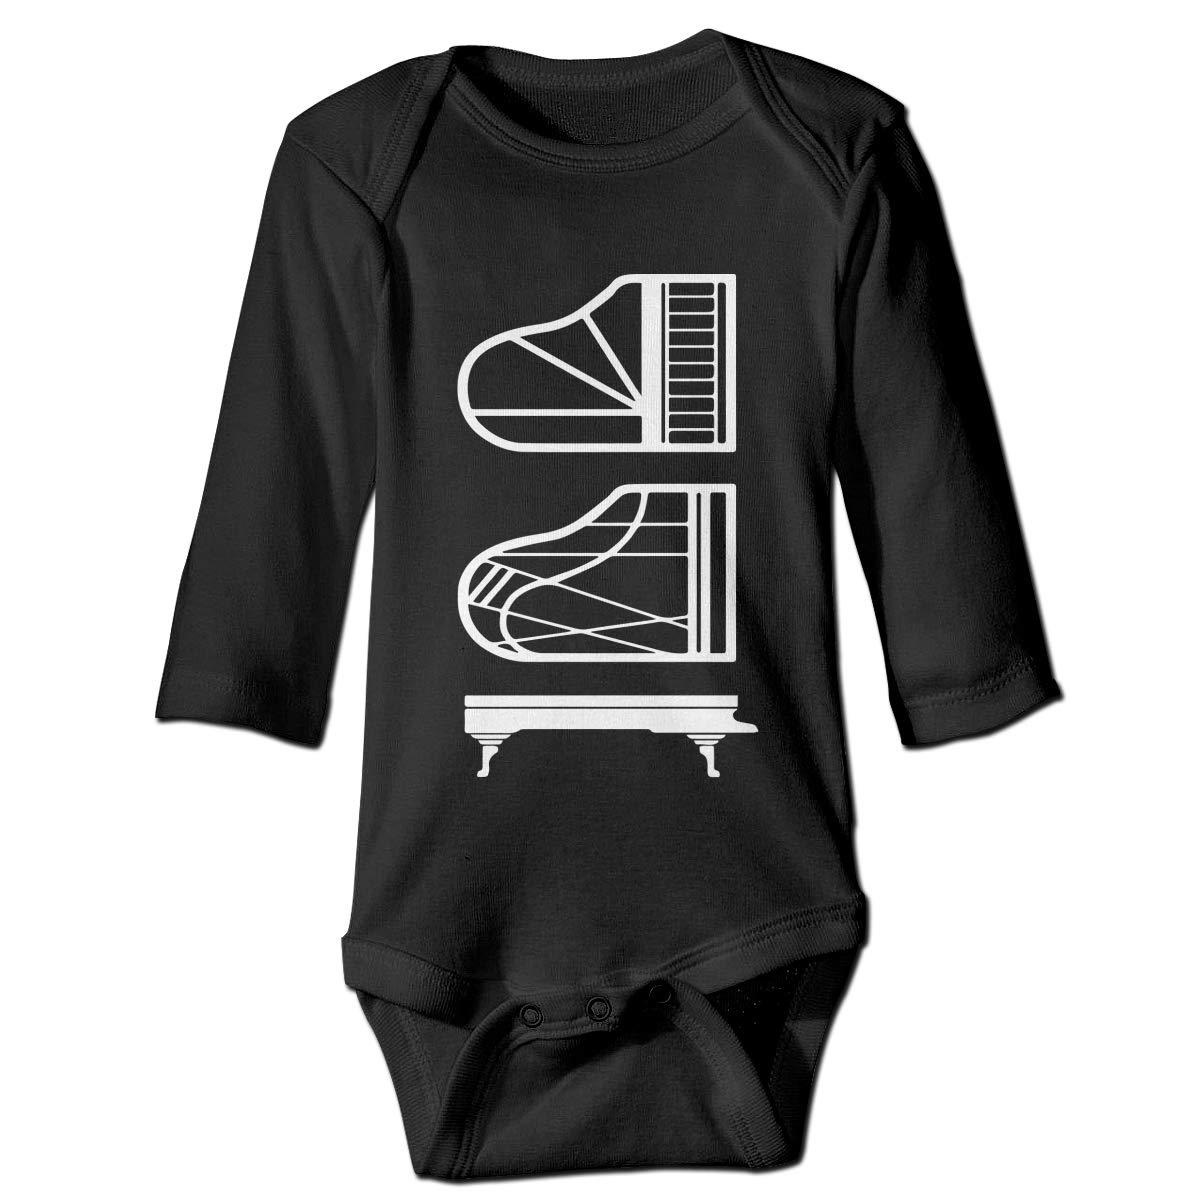 CZDedgQ99 Baby Boys Piano Schematics Long Sleeve Climbing Clothes Pajamas Sleepwear Suit 6-24 Months